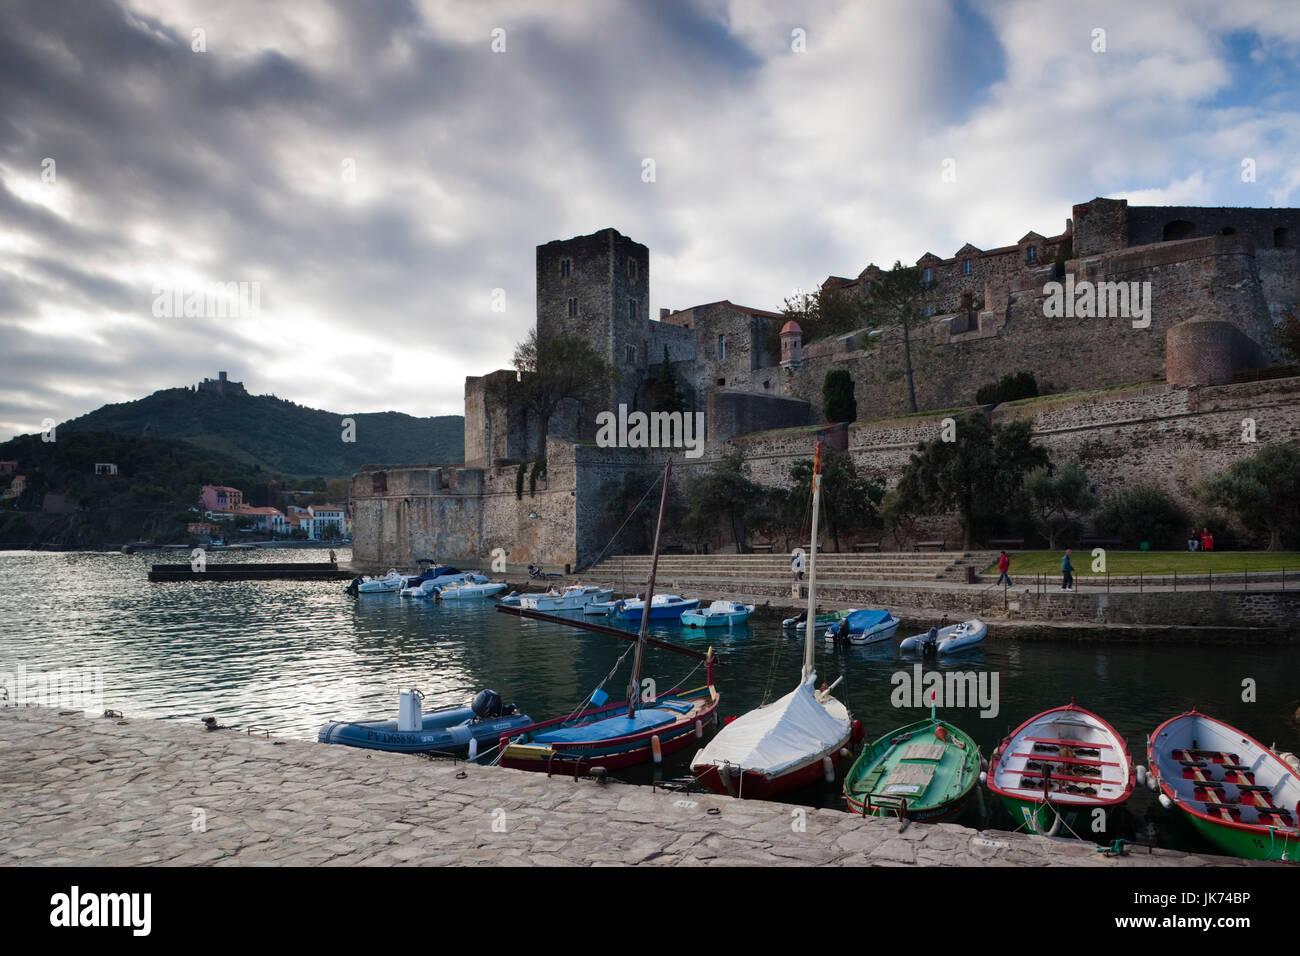 France, Languedoc-Roussillon, Pyrennes-Orientales Department, Vermillion Coast Area, Collioure, Chateau Royal Stock Photo